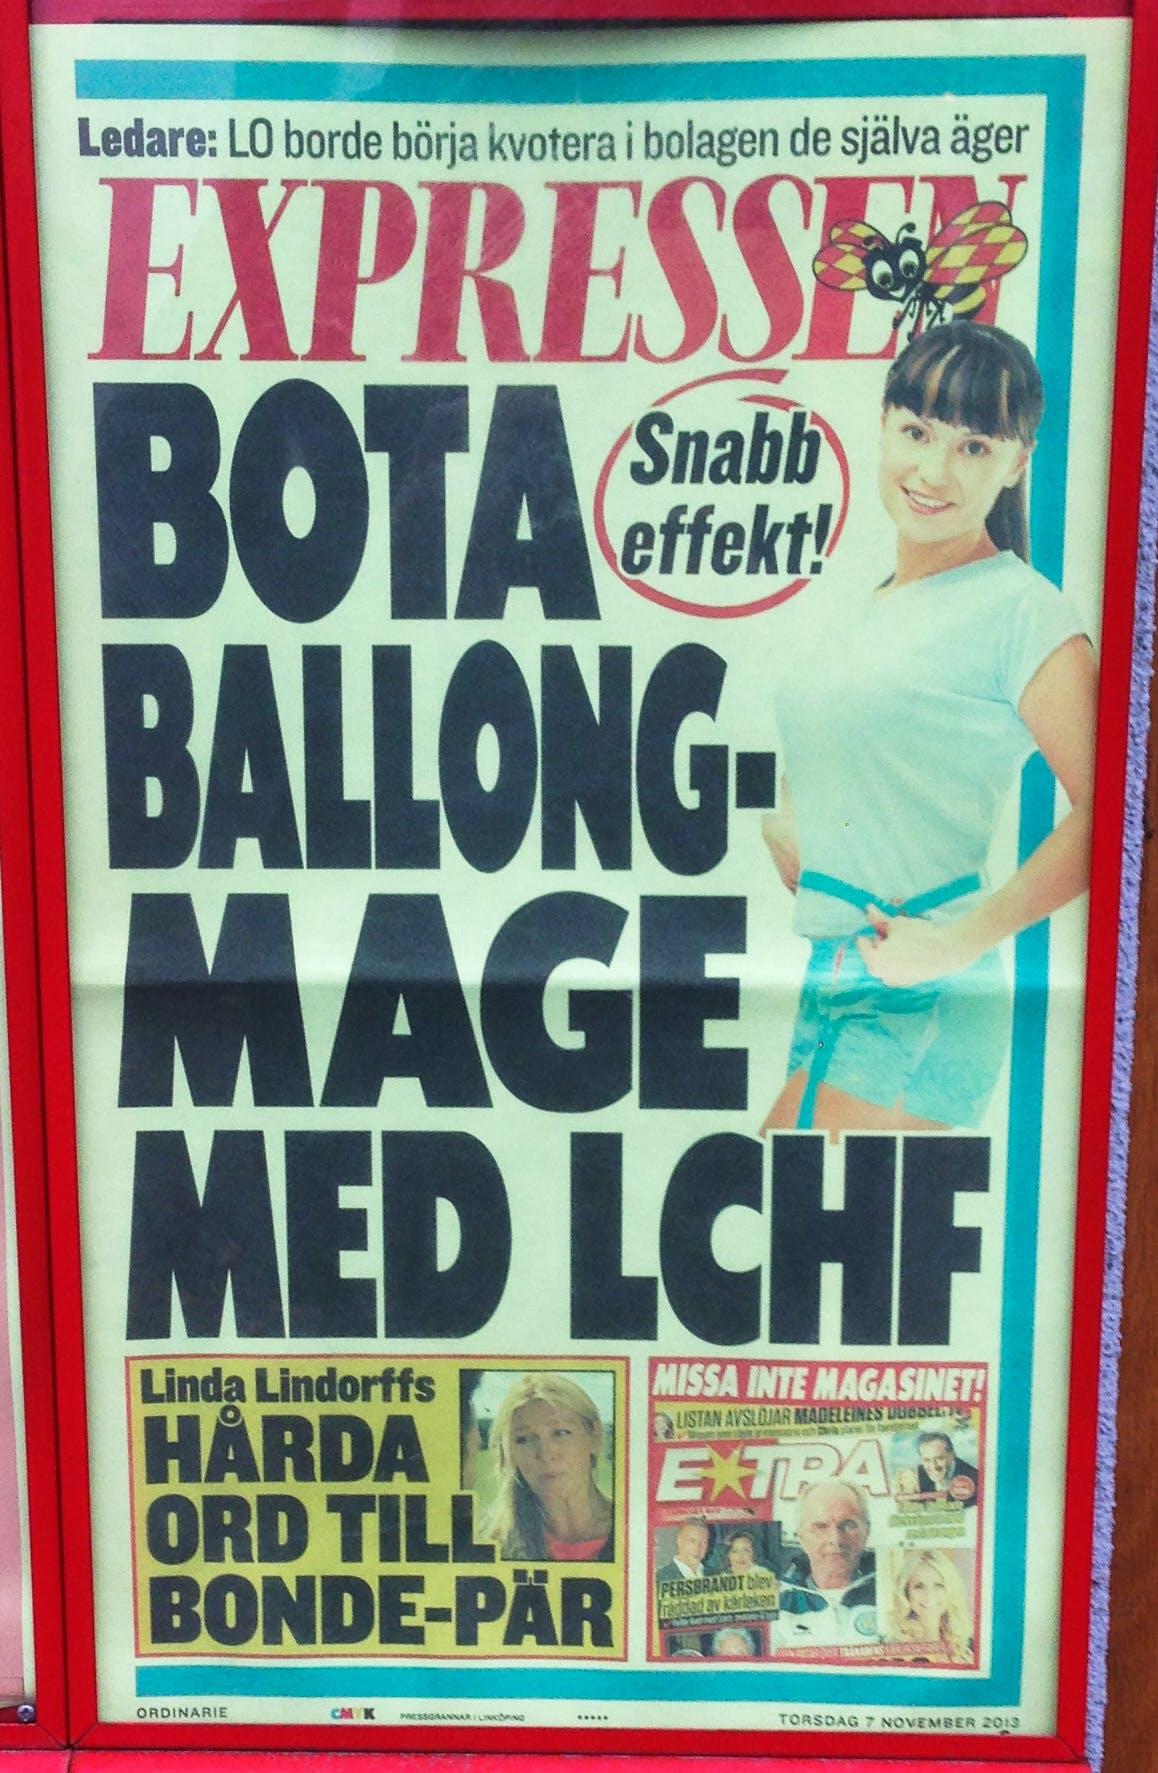 Bota ballongmage med LCHF